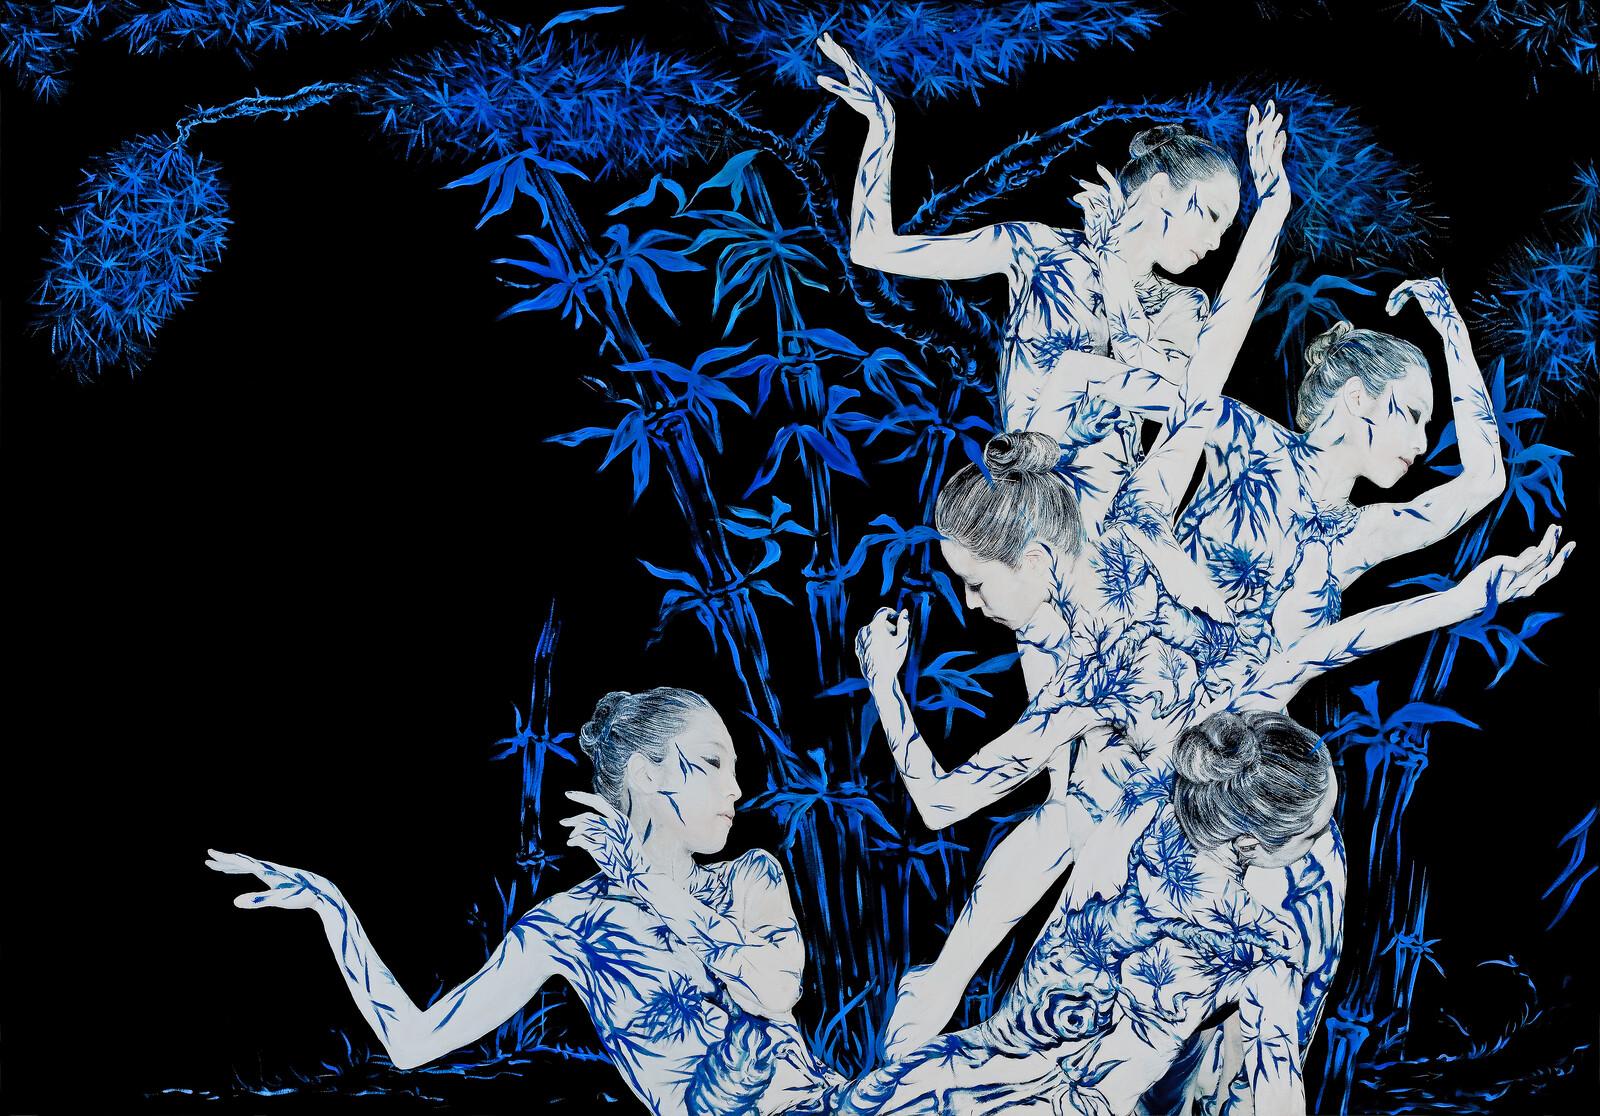 Blue Black Porcelain 03 - Dallae Bae